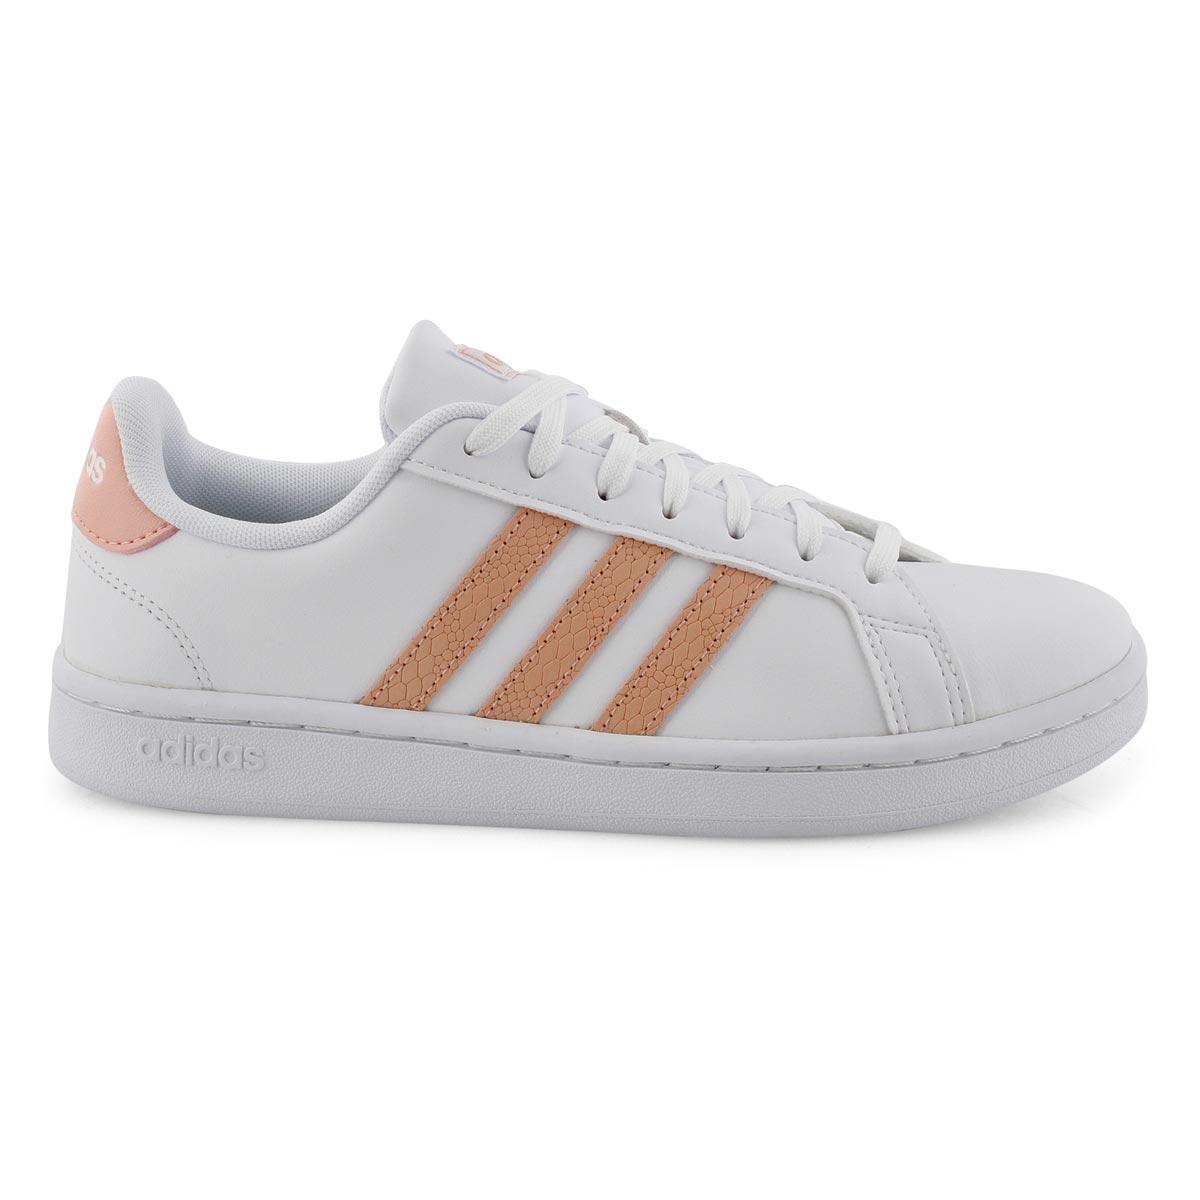 Lds Grand Court wht/pnk sneaker